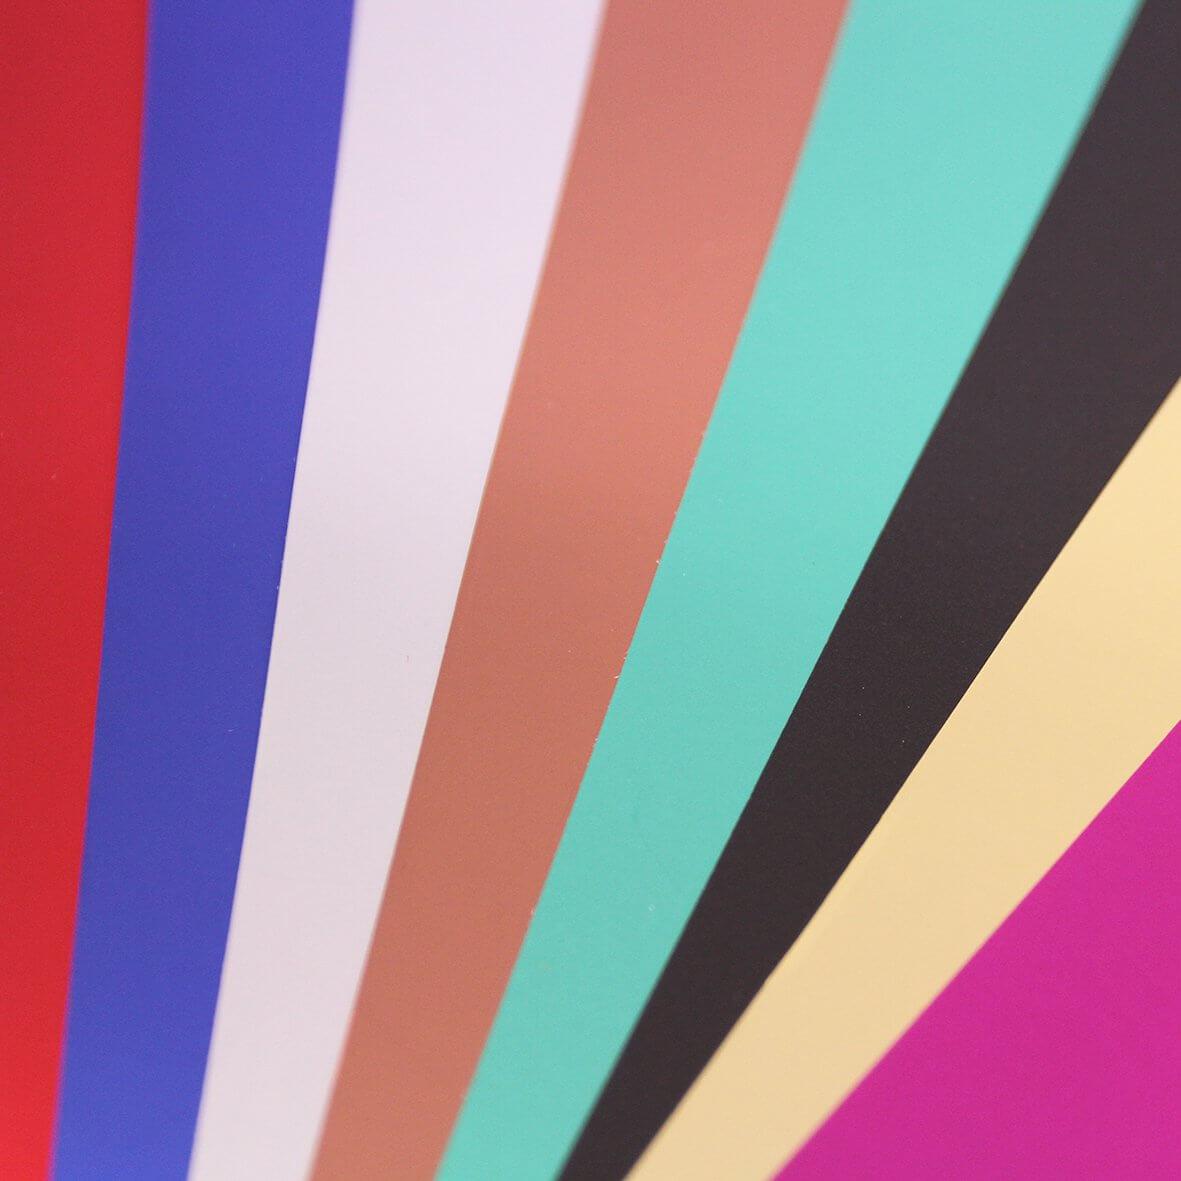 Mirri Swatch - Mirri Card, Silk and Sparkle